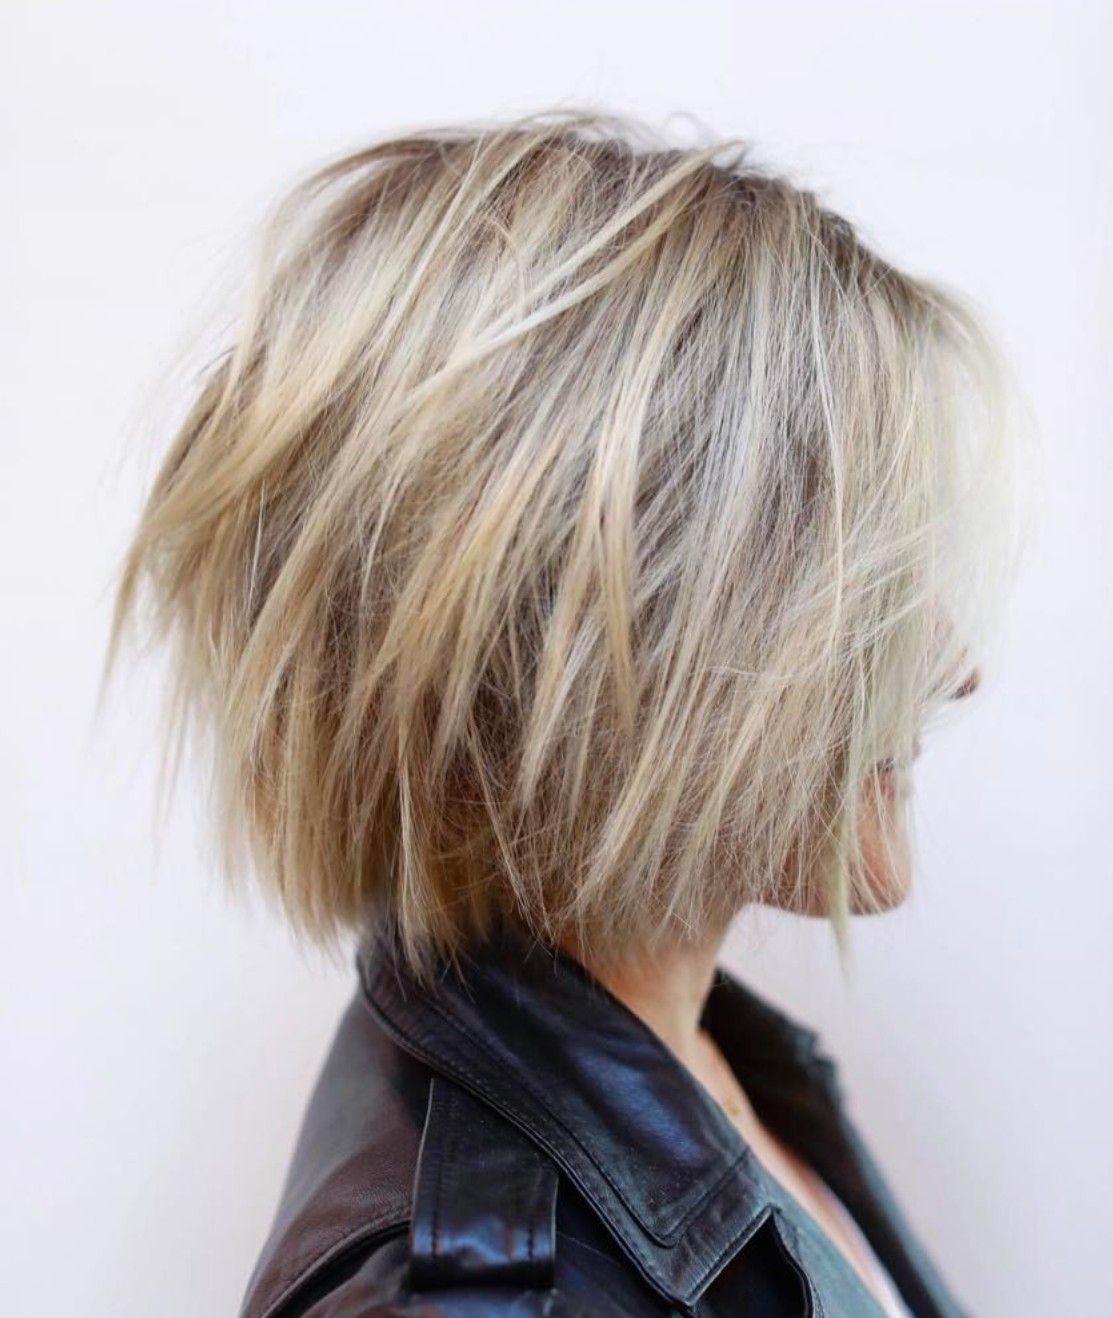 Pin By Nikki LeBlanc On Hair!